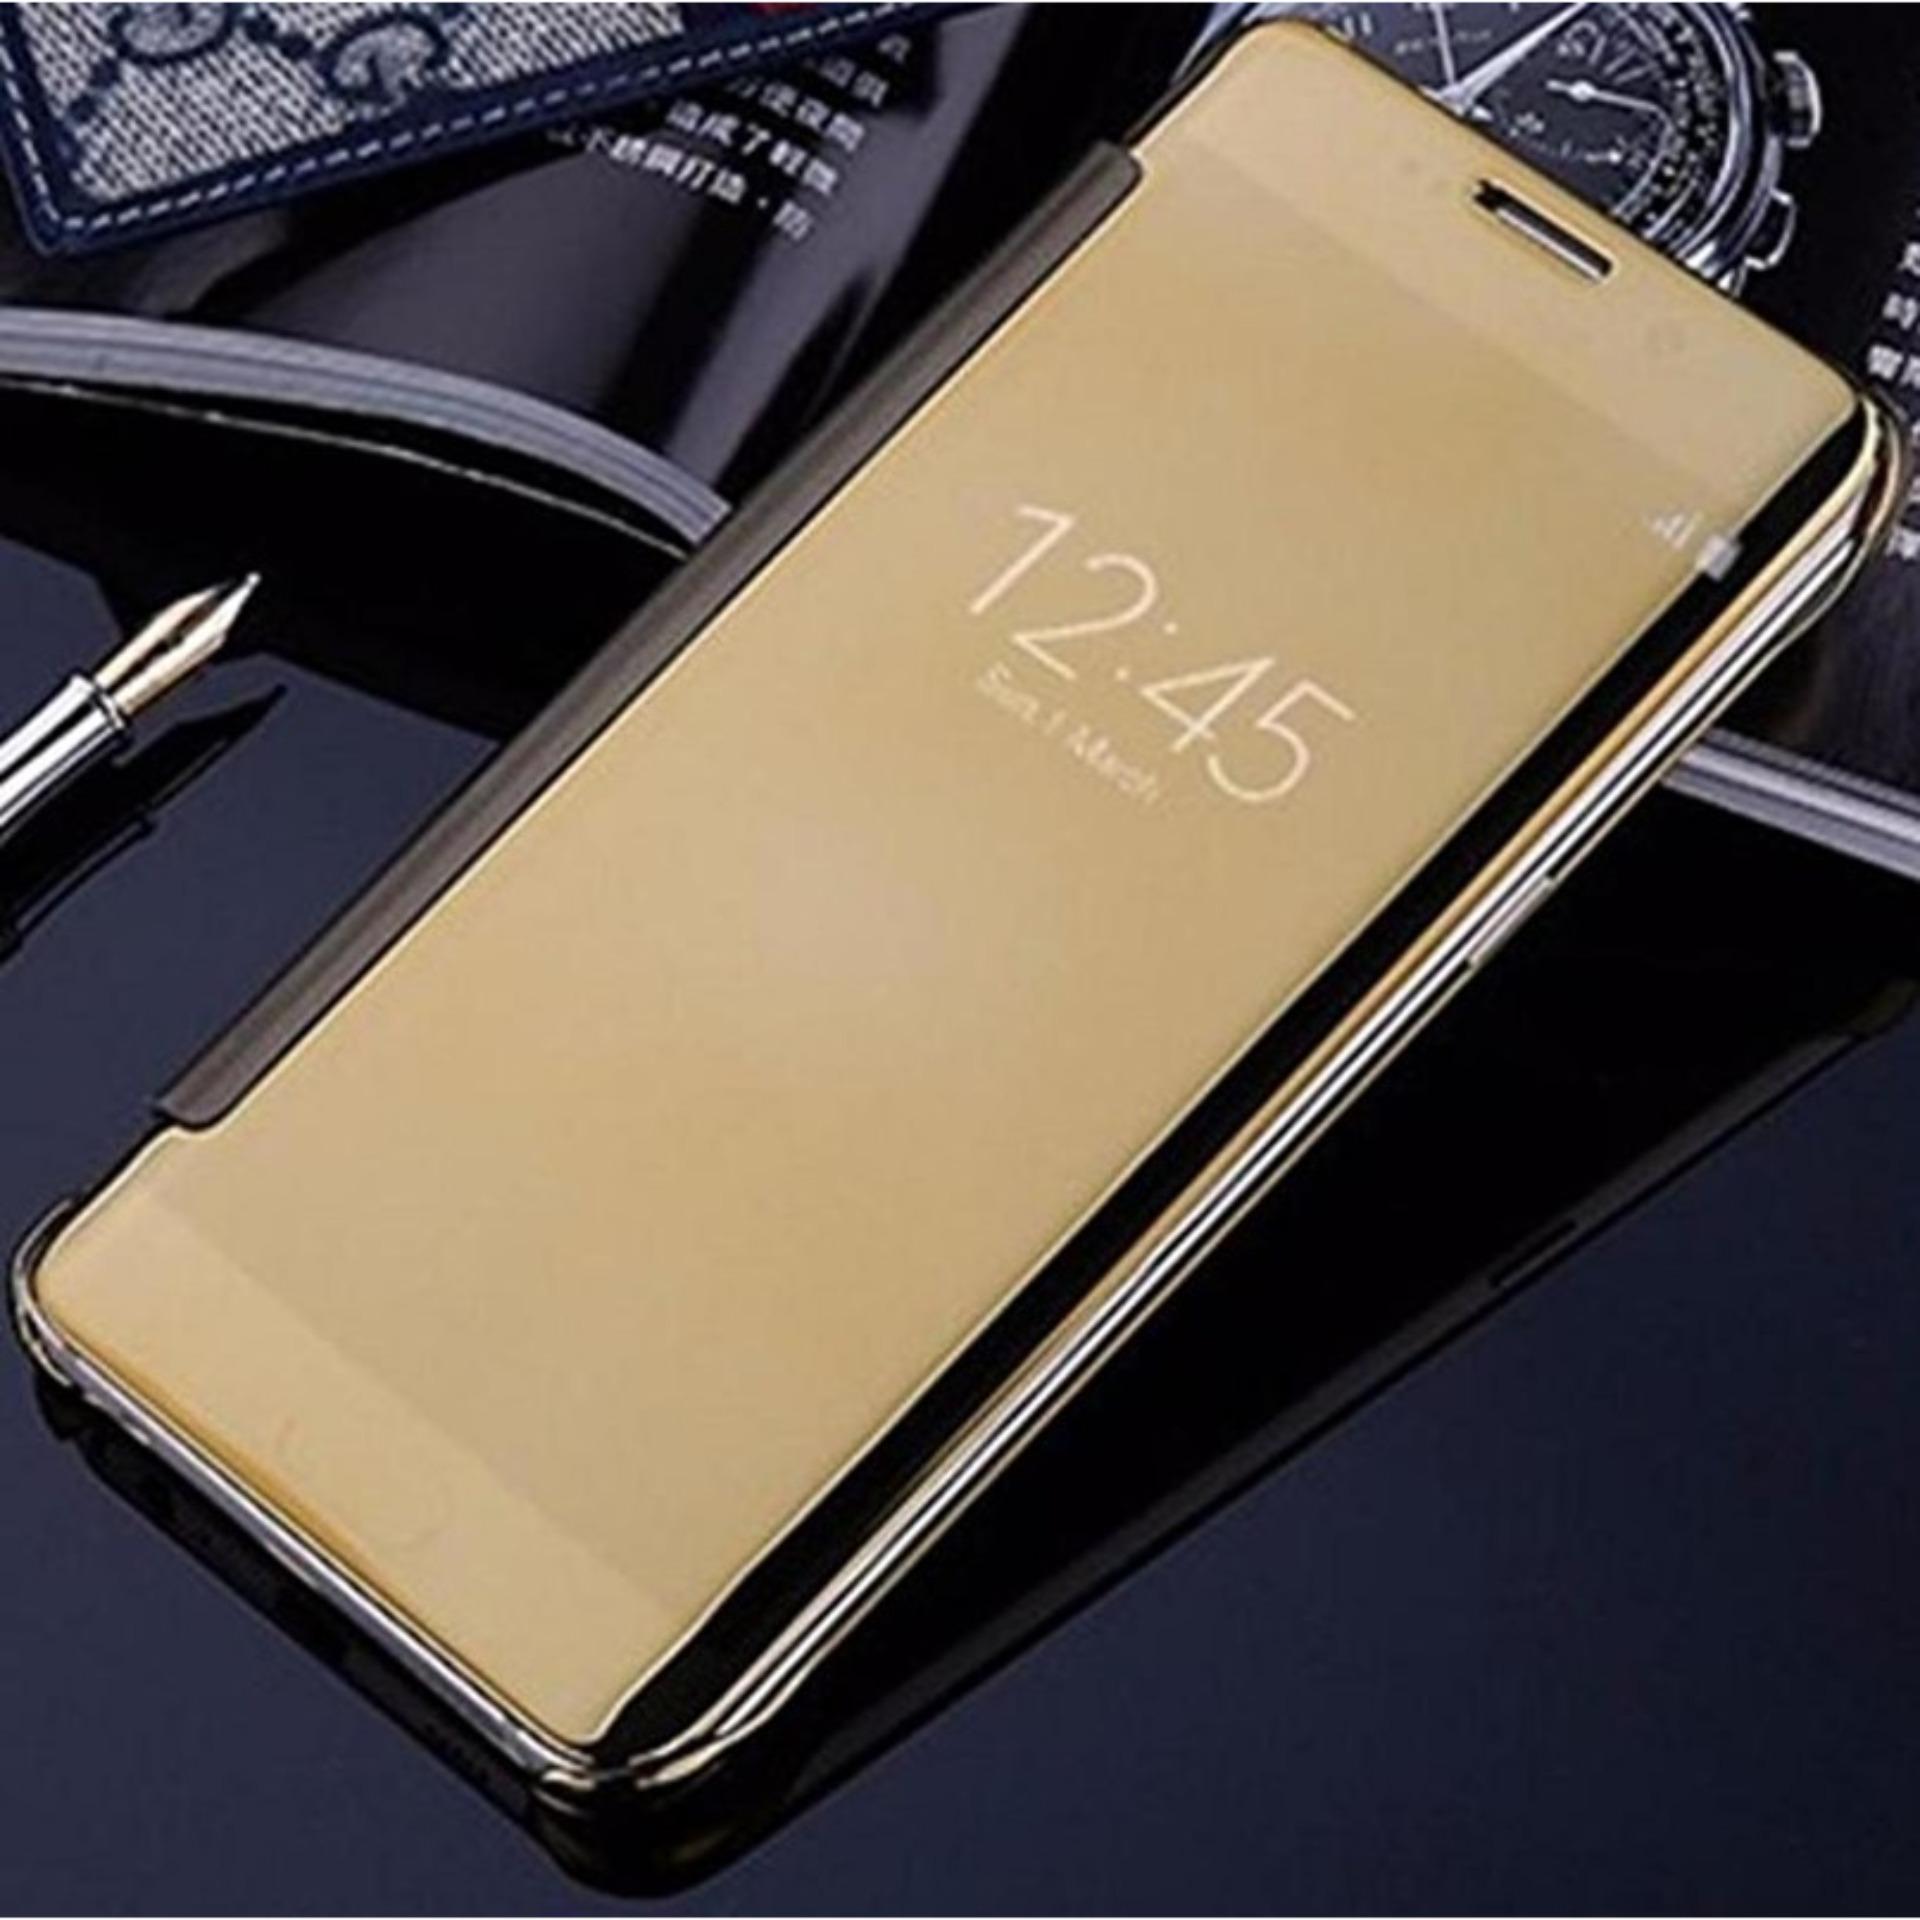 Case For Samsung Galaxy A8 2018 Flipcase Flip Mirror Cover S View Transparan Auto Lock Casing Hp- Gold